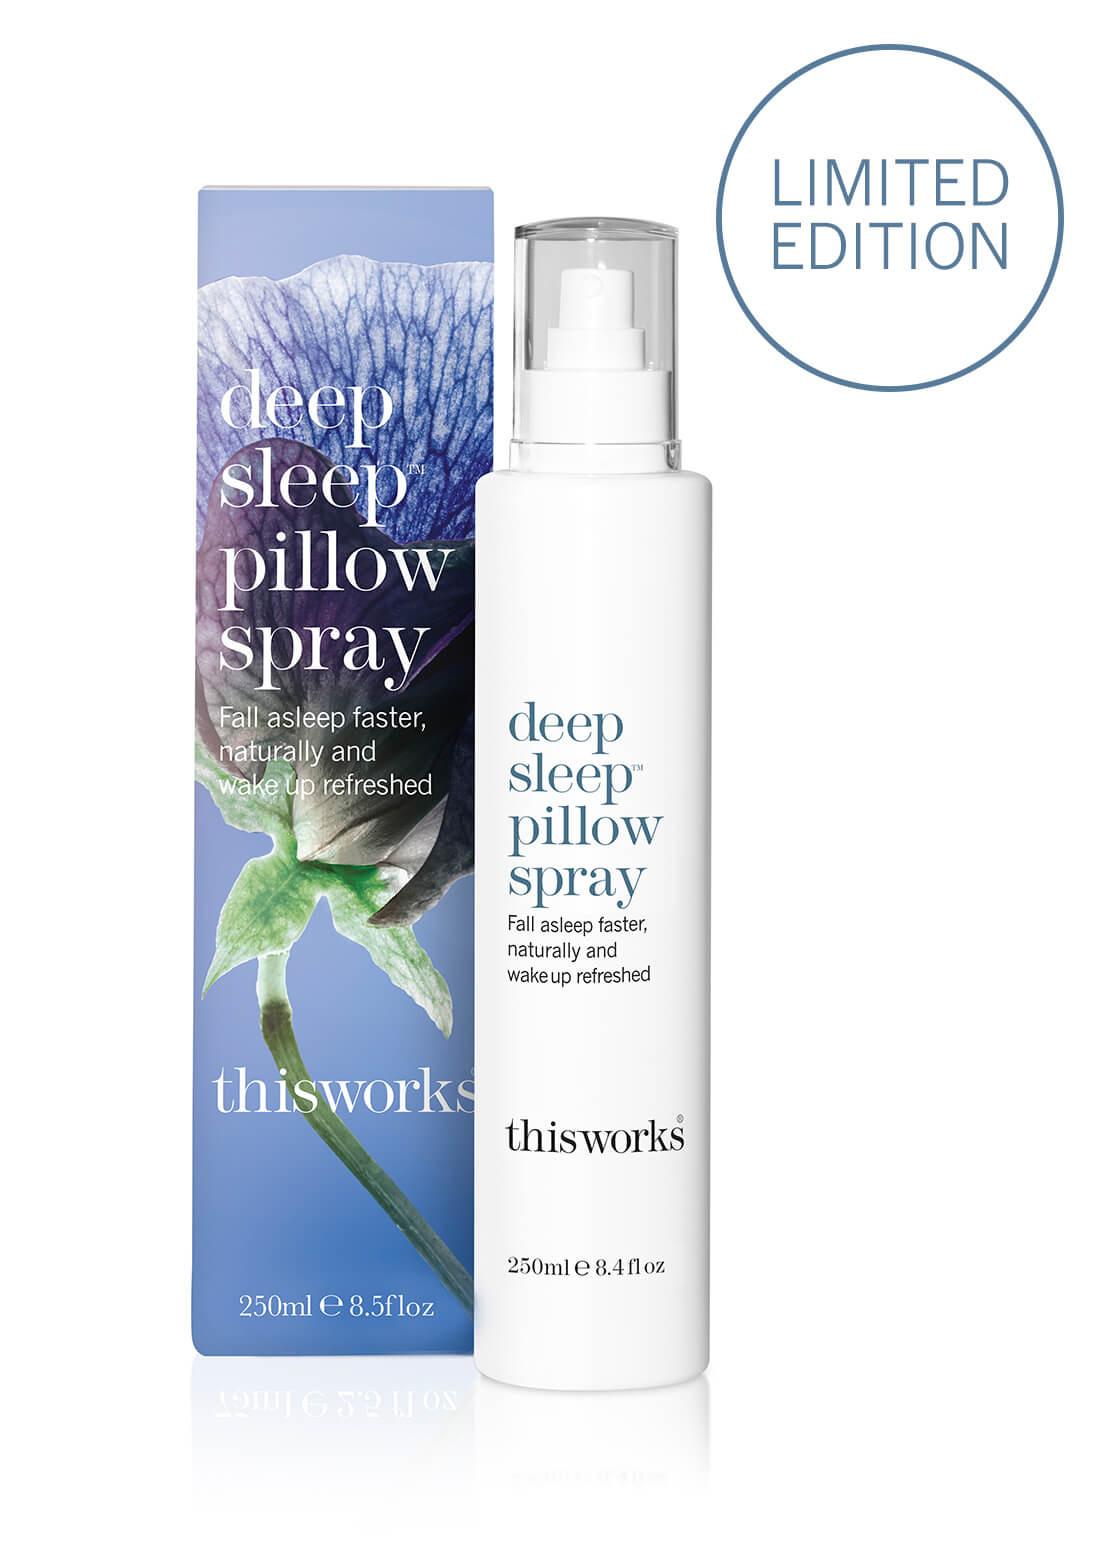 THIS WORKS sleep spray 250ml £26.25 was £35